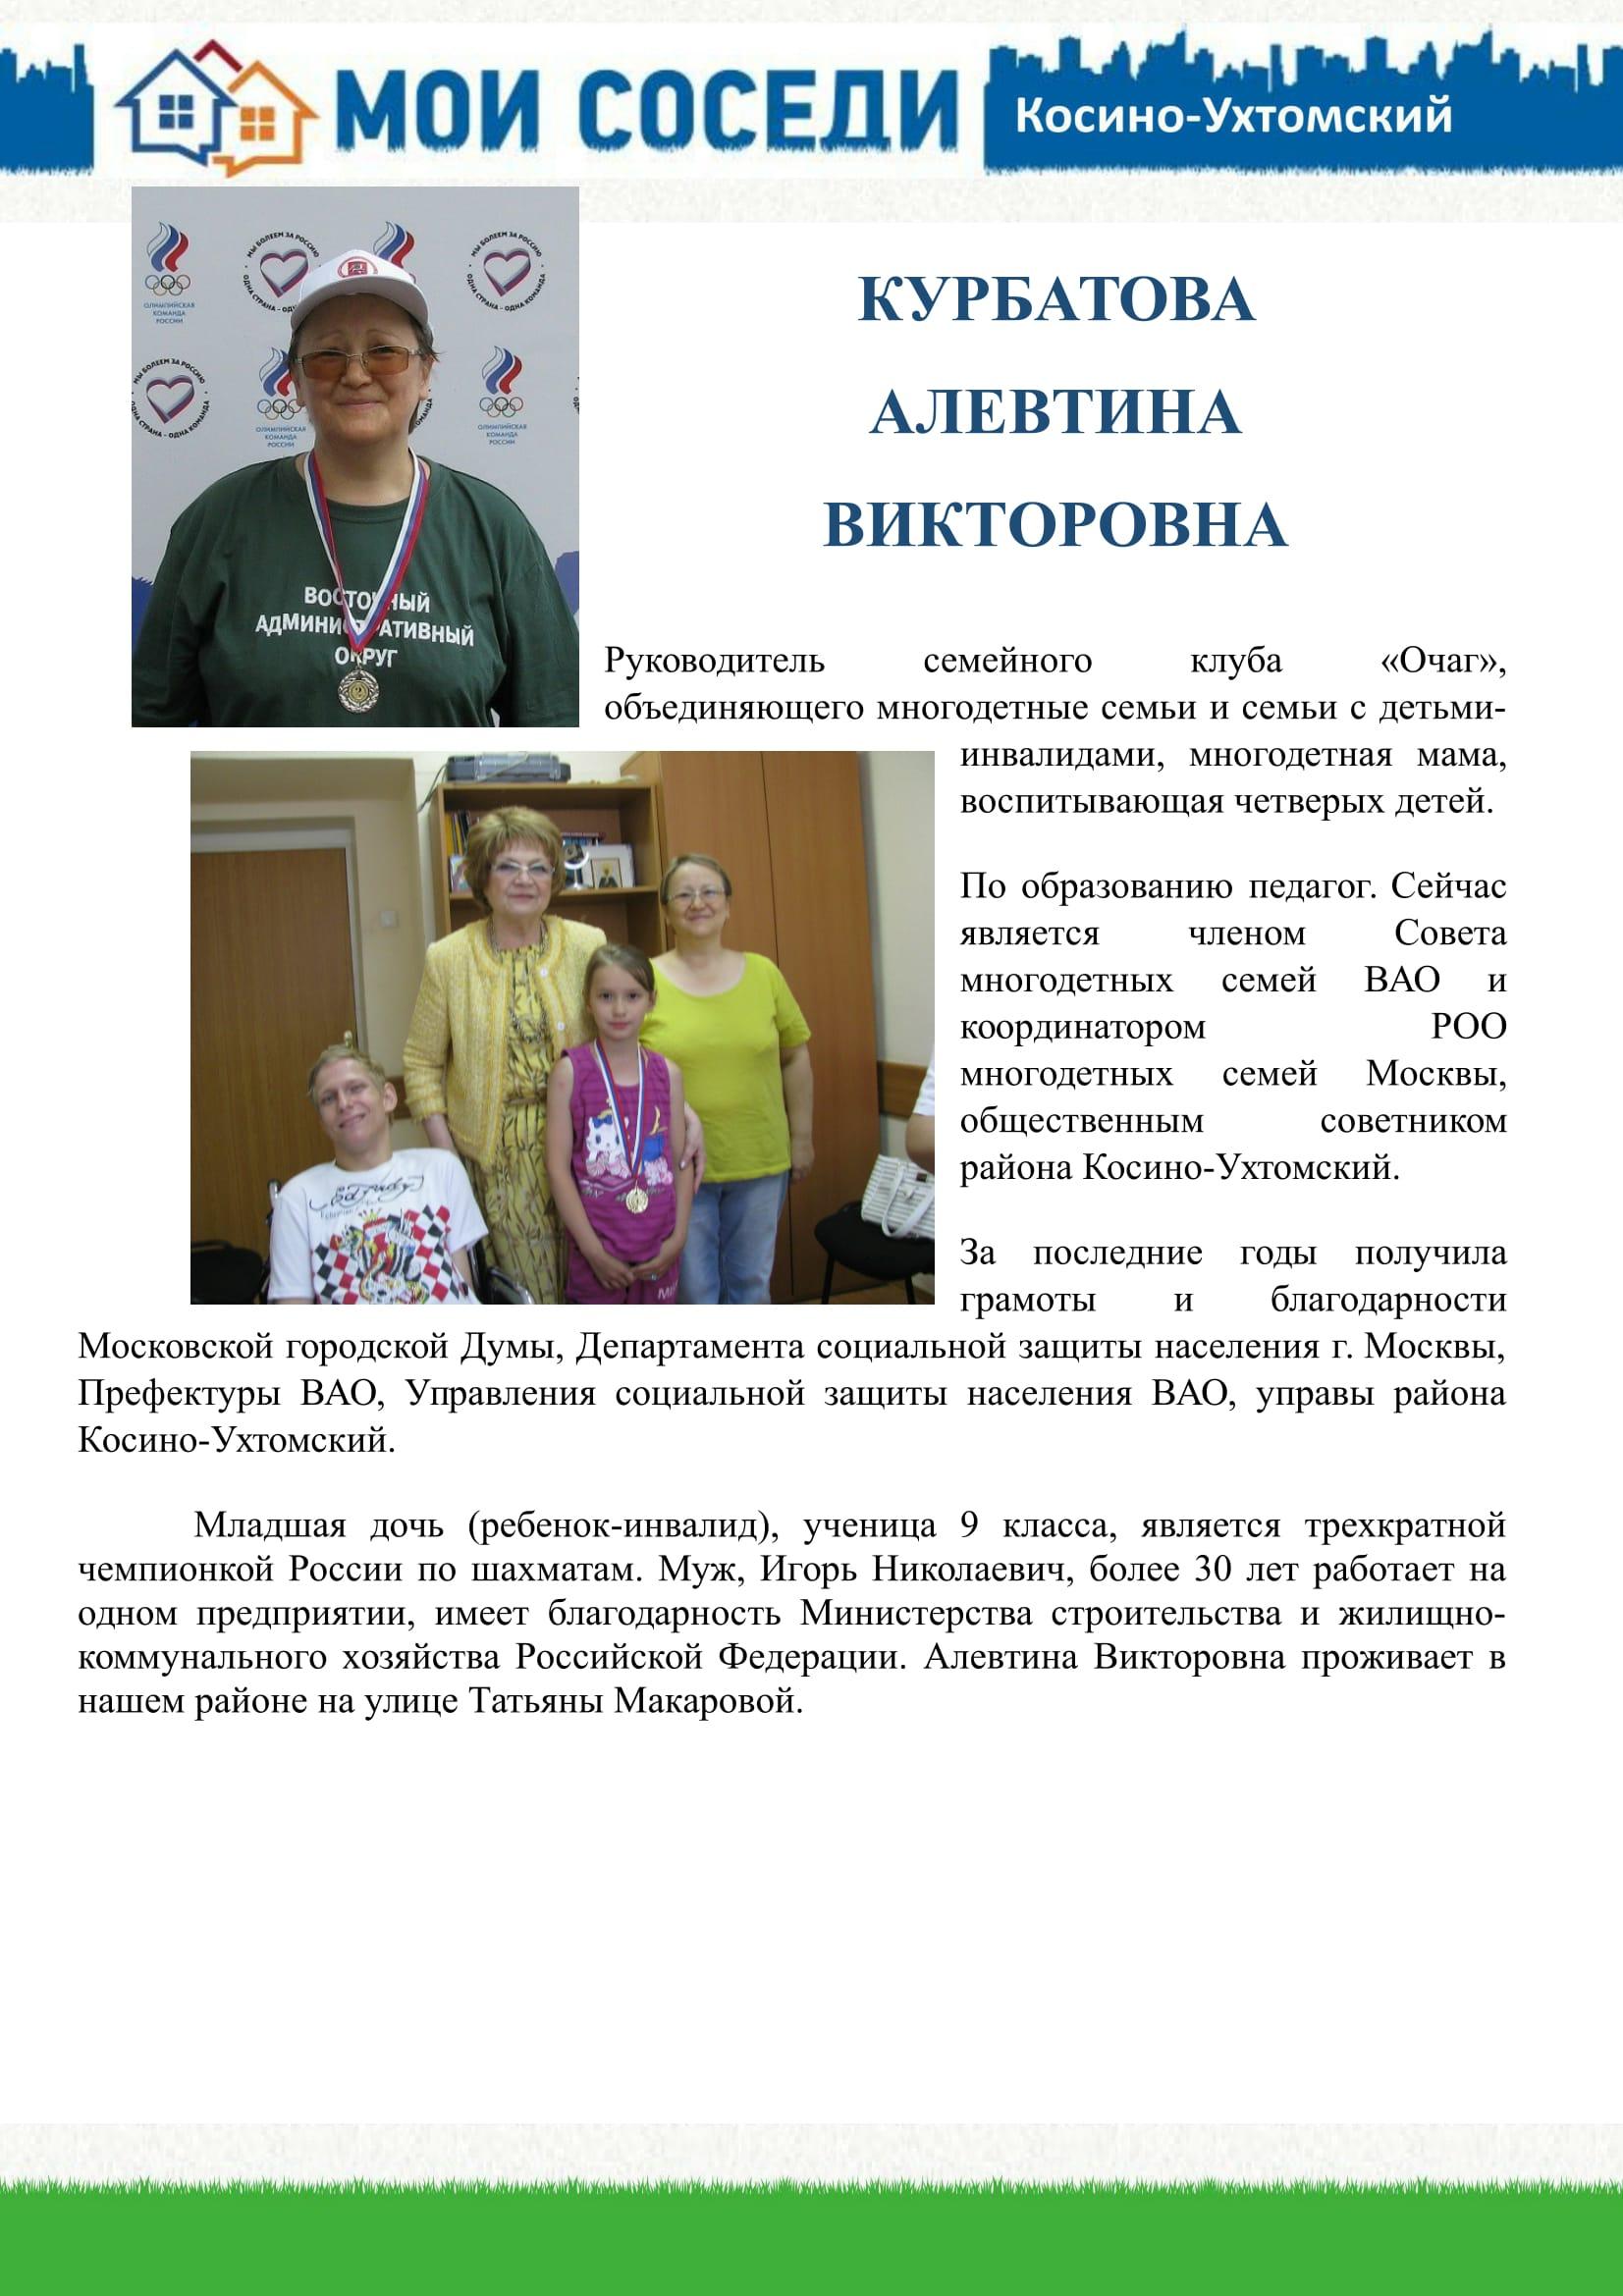 Курбатова-1